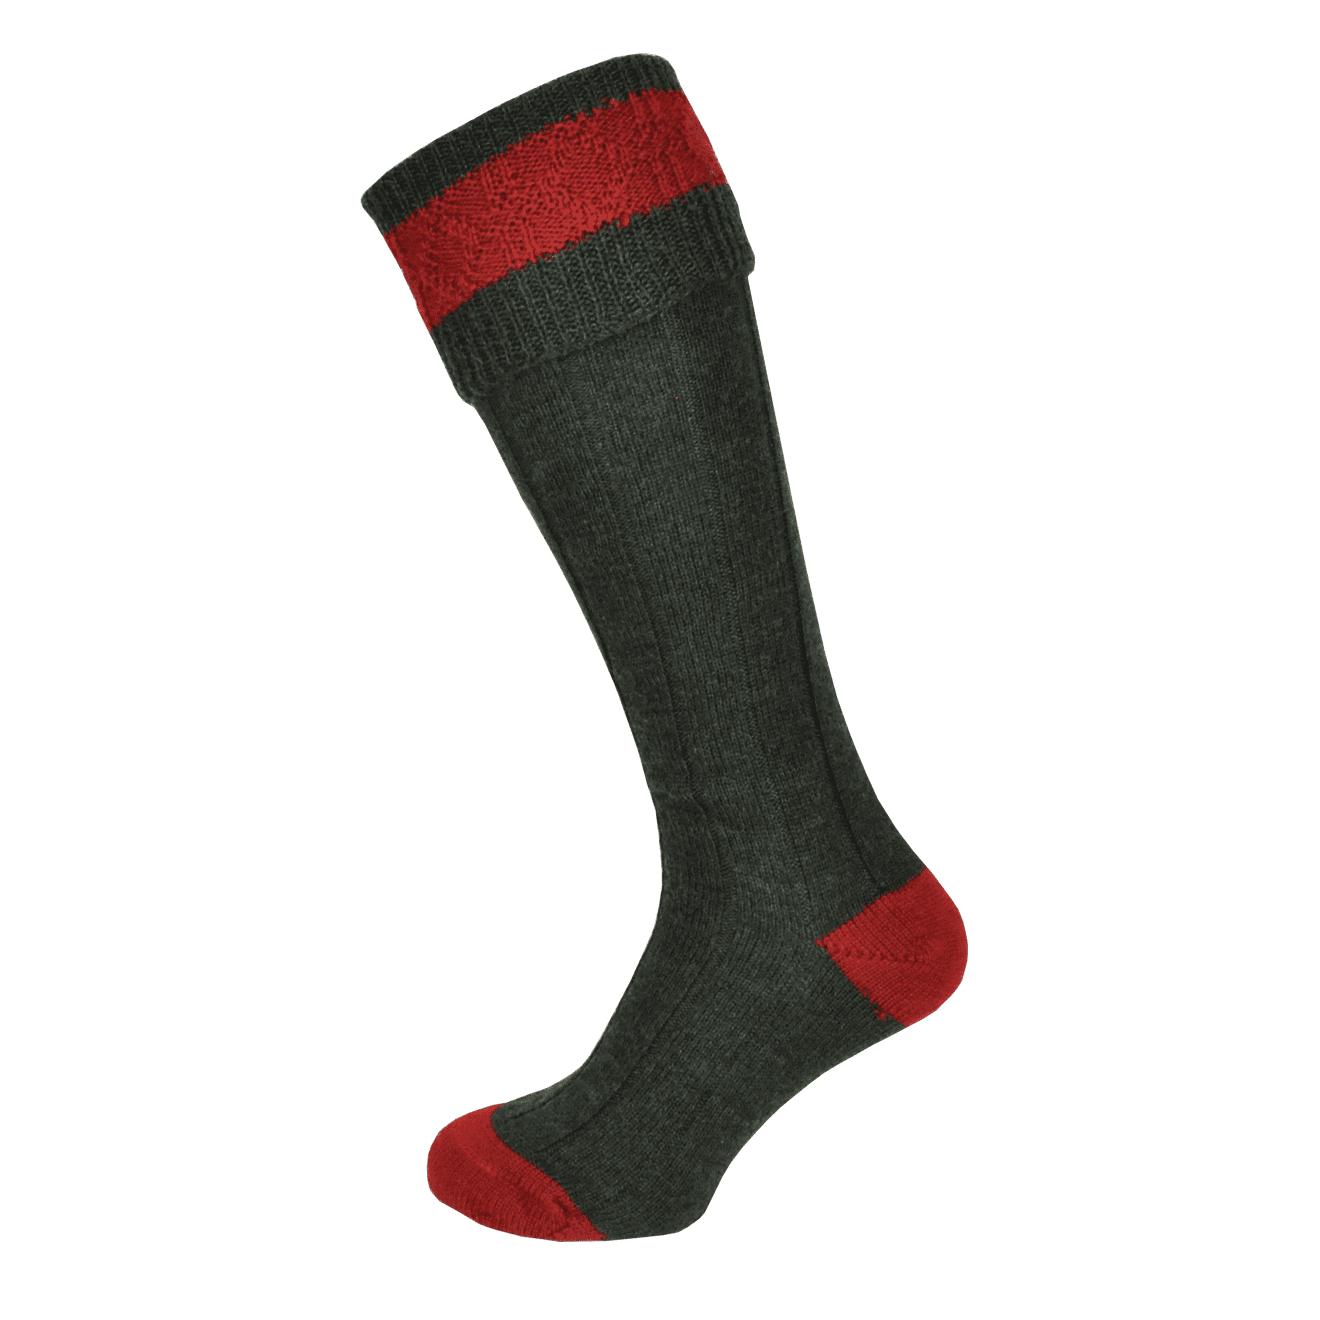 Macfarlaine Contrast Shooting Socks Green / Red